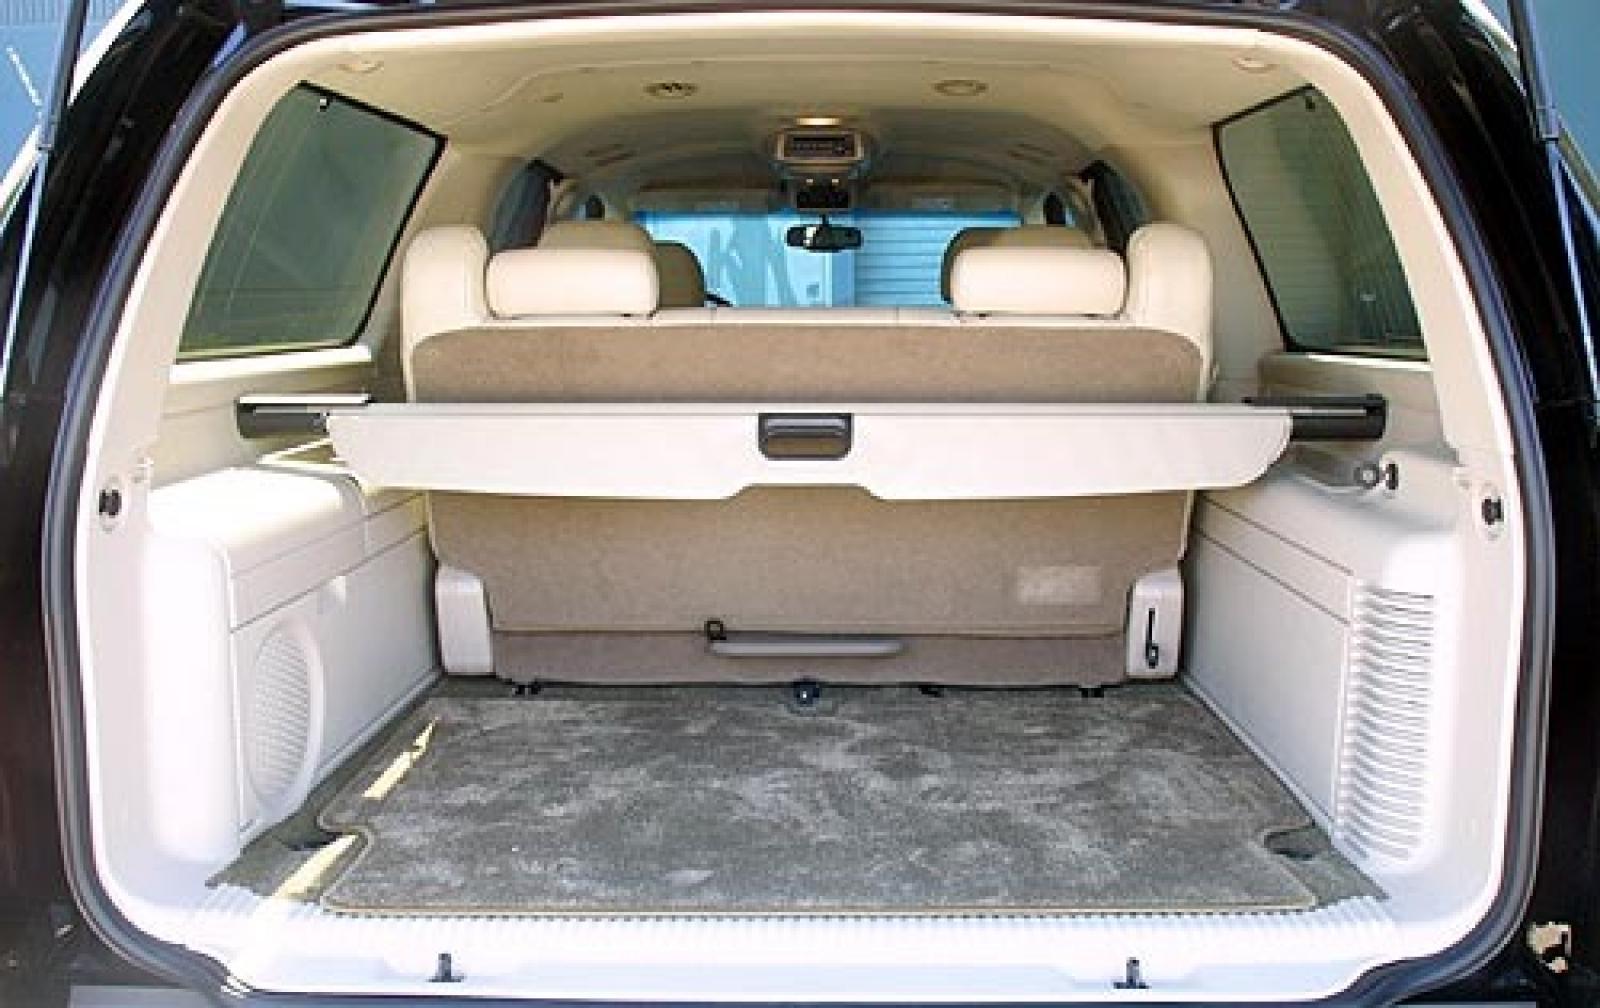 2004 Cadillac Escalade ESV - Information and photos - Zomb Drive